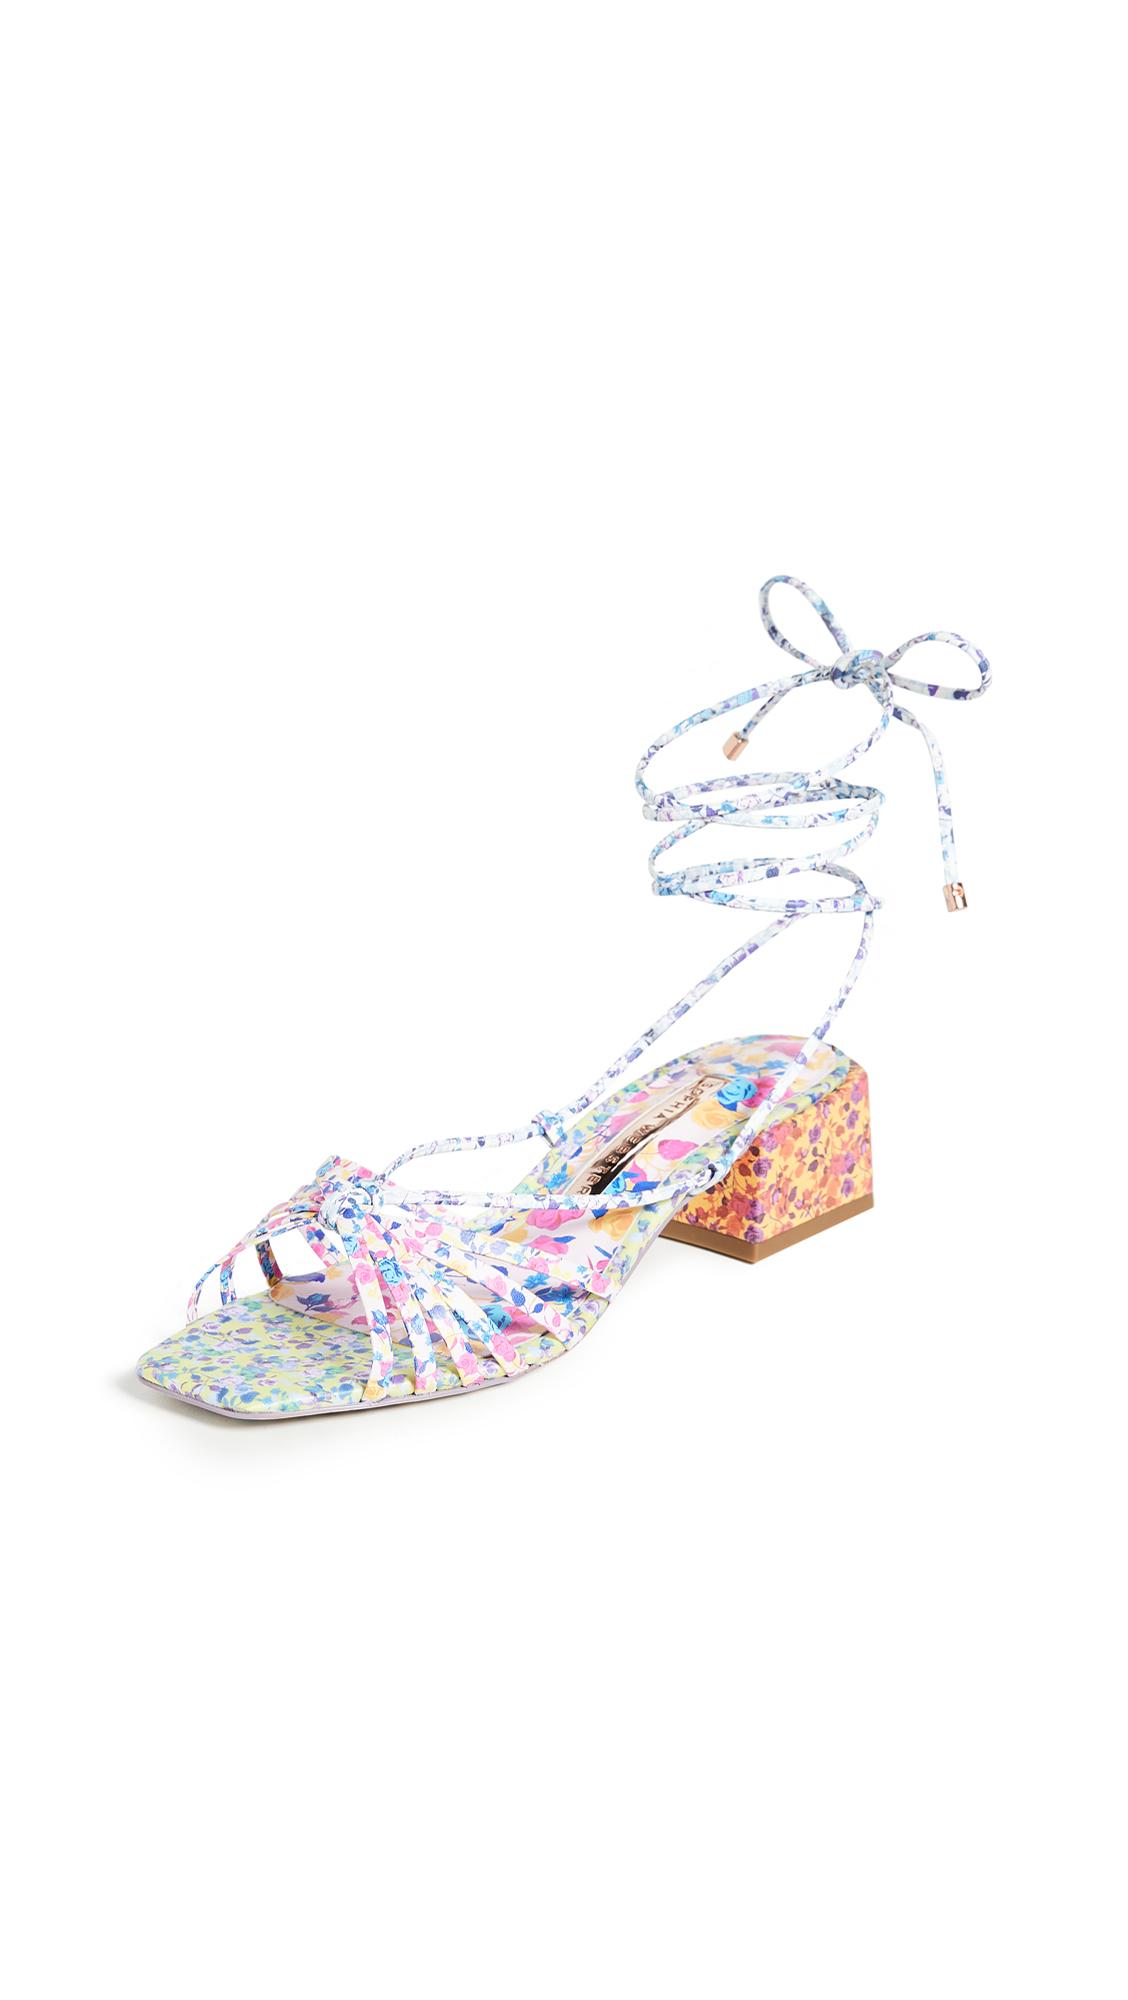 Buy Sophia Webster Laurellie Low Sandals online, shop Sophia Webster